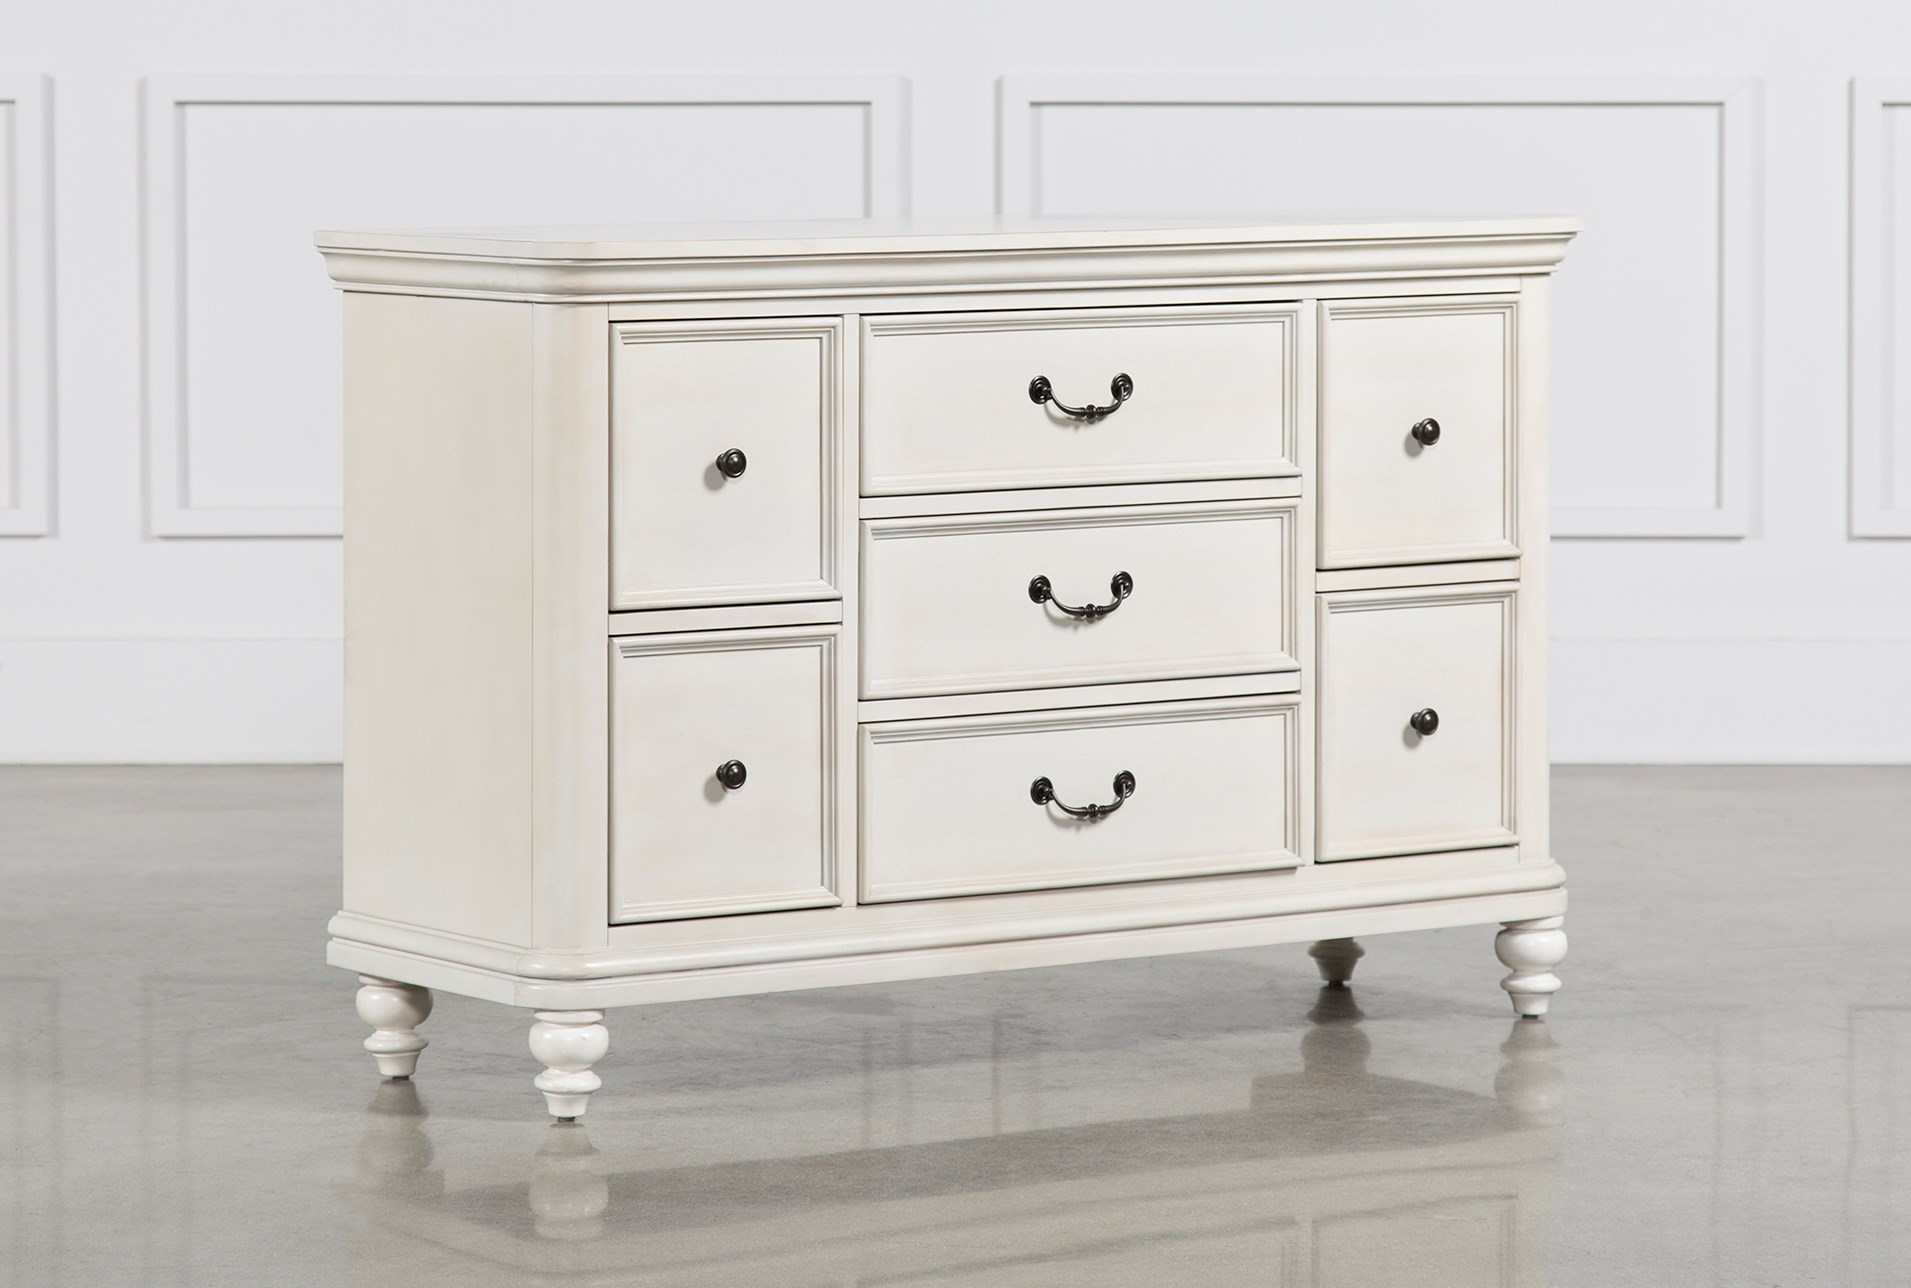 wayfair image for sale baby solutions com near dressers of best me reviravoltta dresser